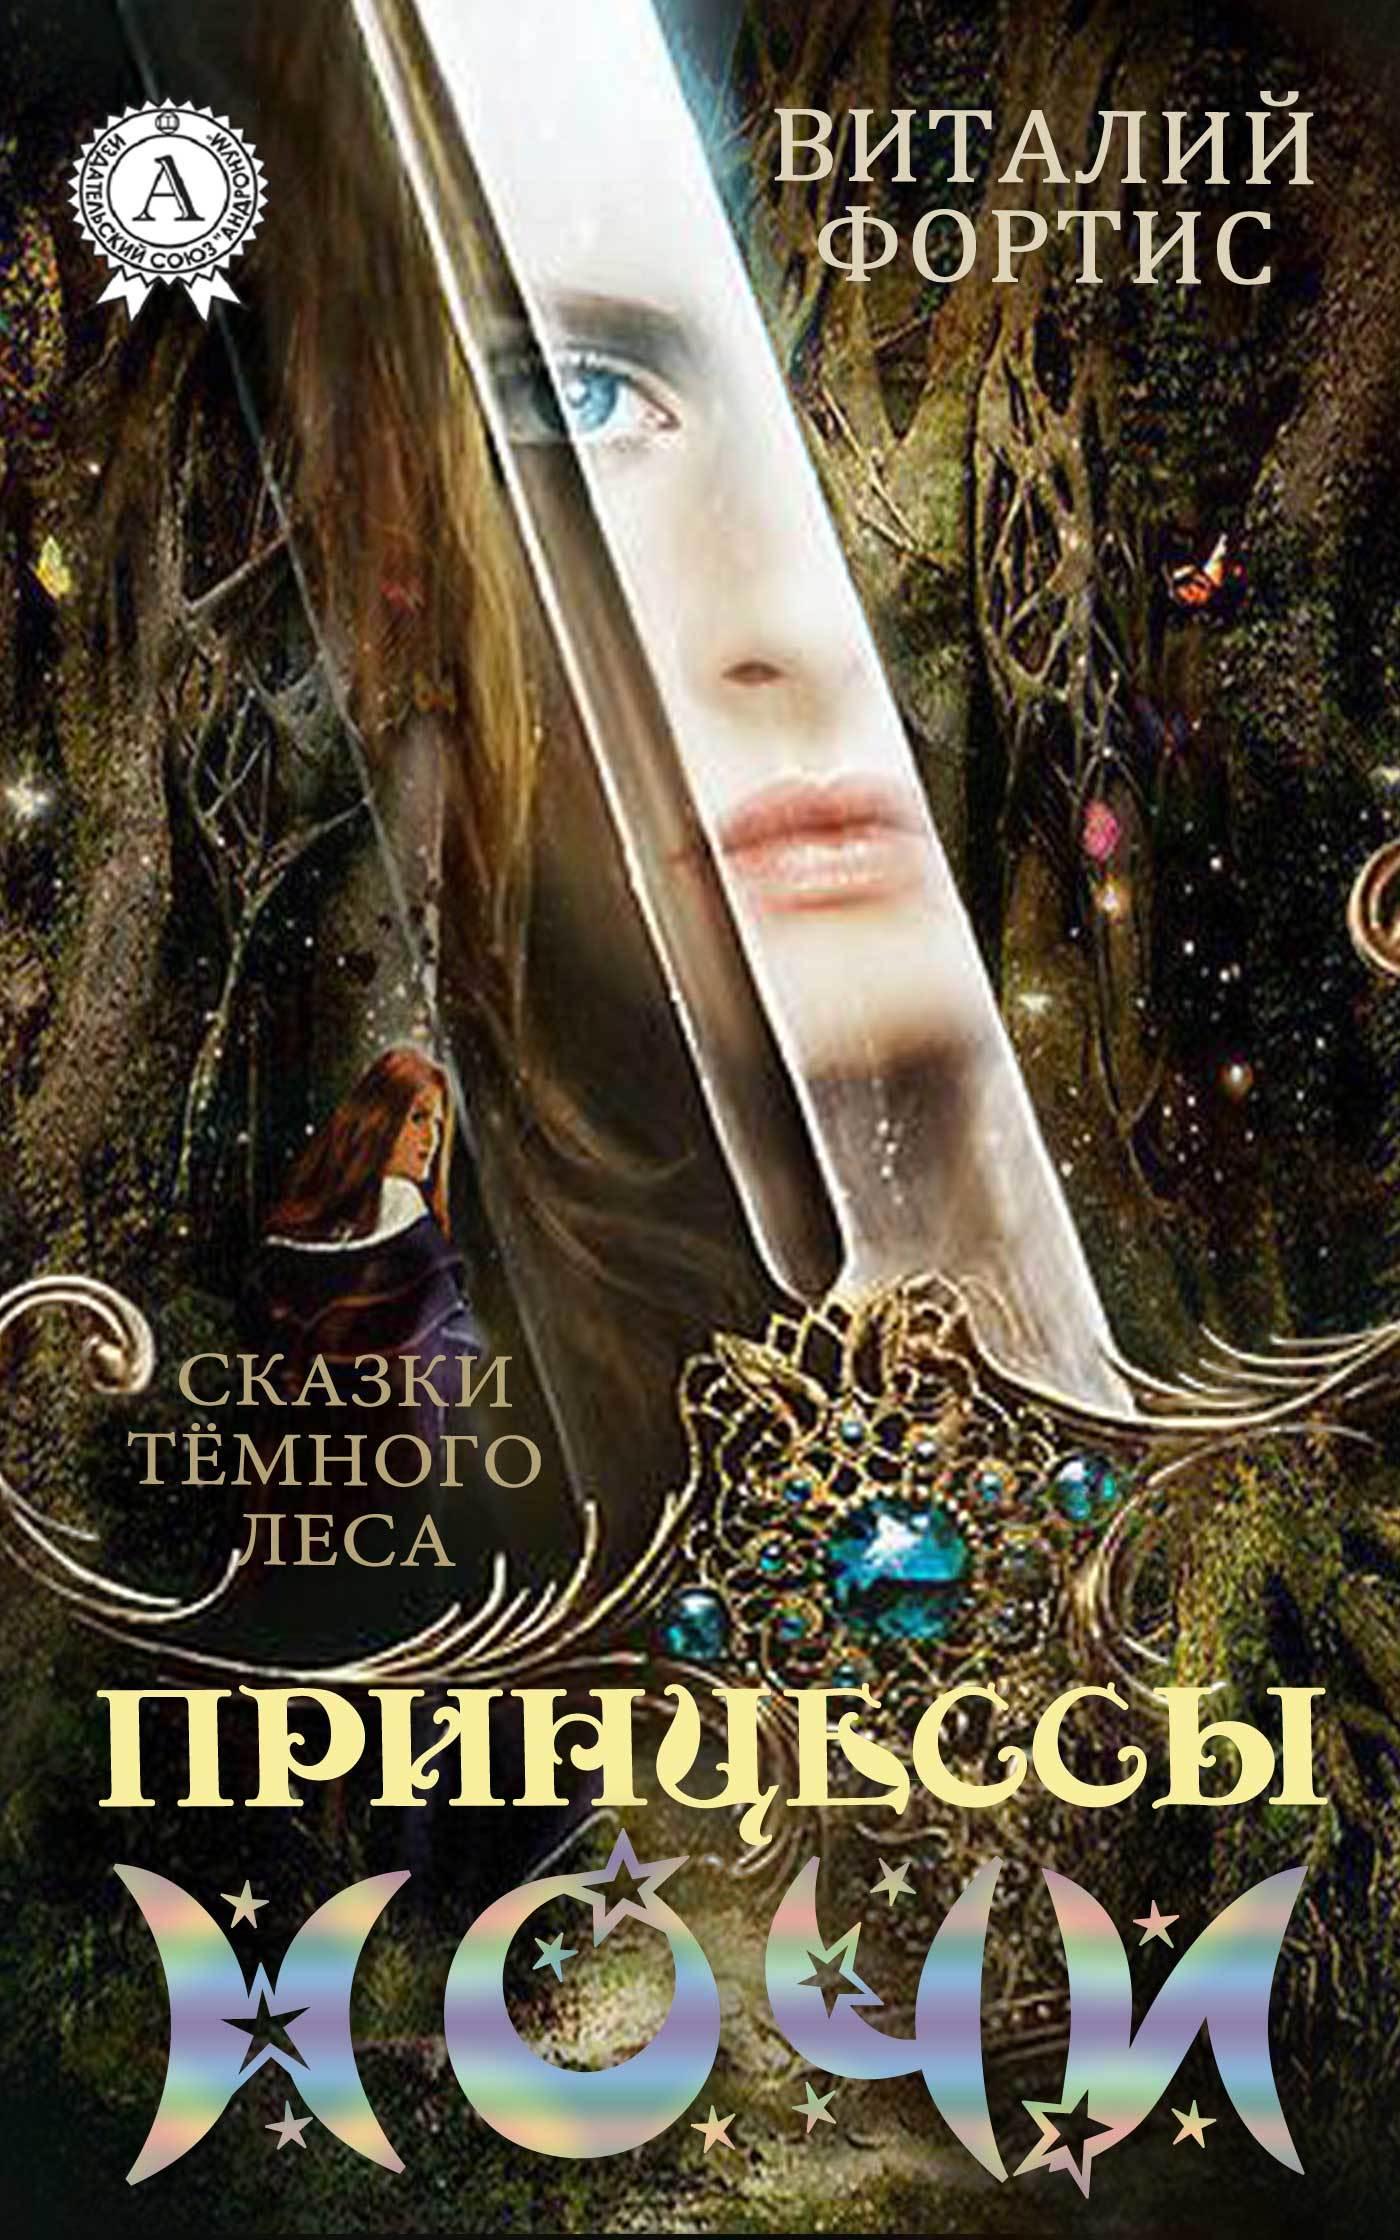 Виталий Фортис - Принцессы ночи